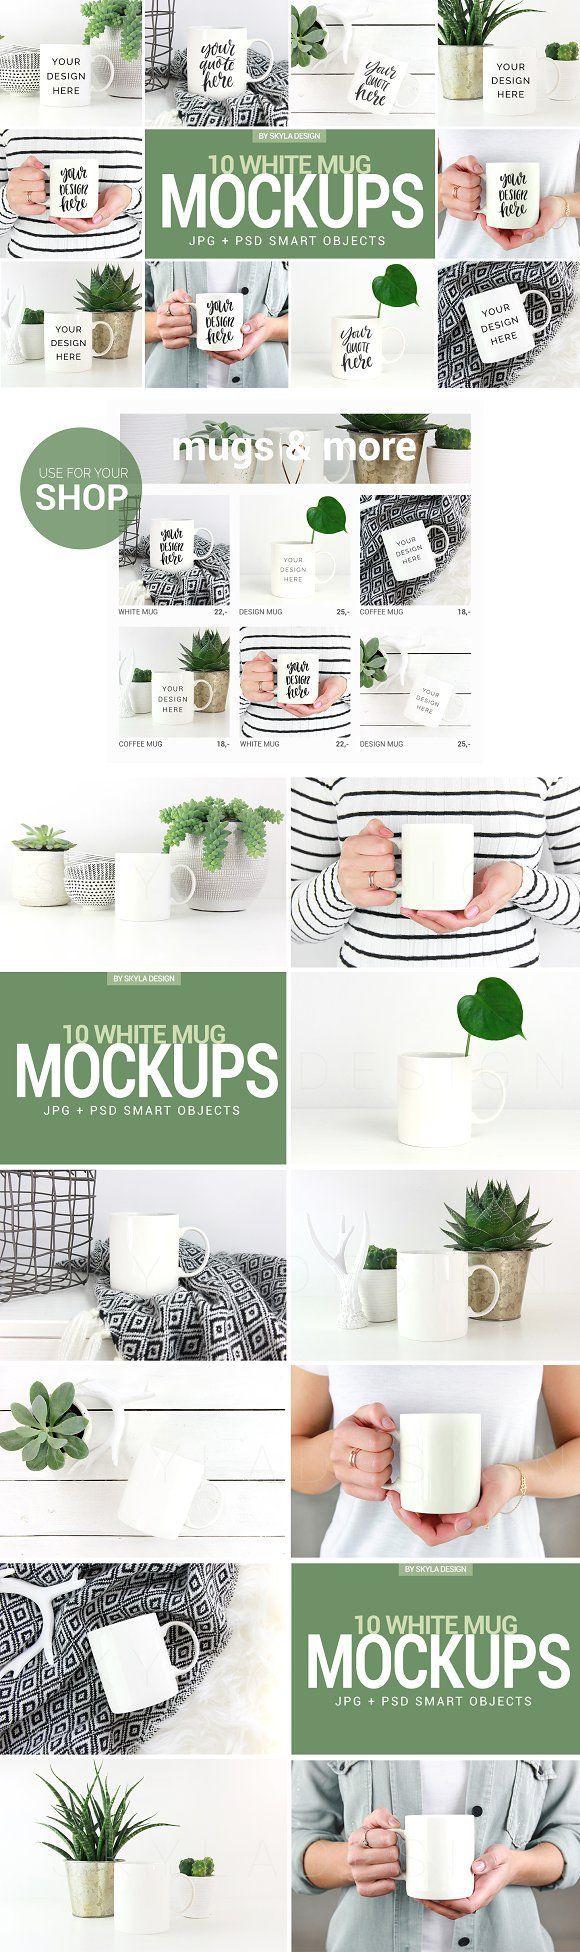 White coffee mug mockup photos with green lifestyle home by Skyla Design on @creativemarket